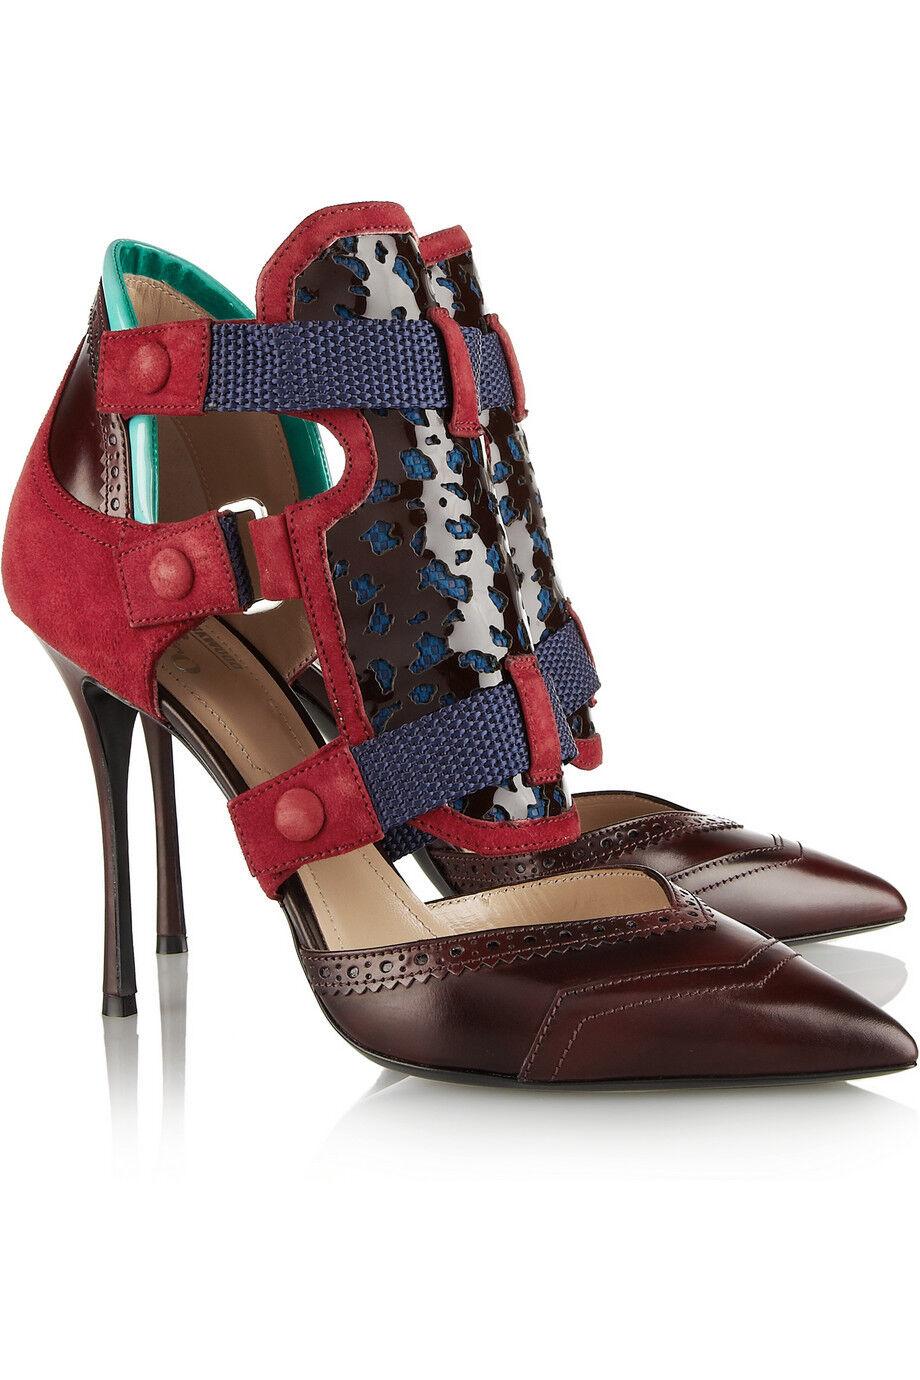 Nicholas Kirkwood X Peter Pilotto Foncé Rouge Oxford Chaussures Plates Plates Plates Neuf a2f193